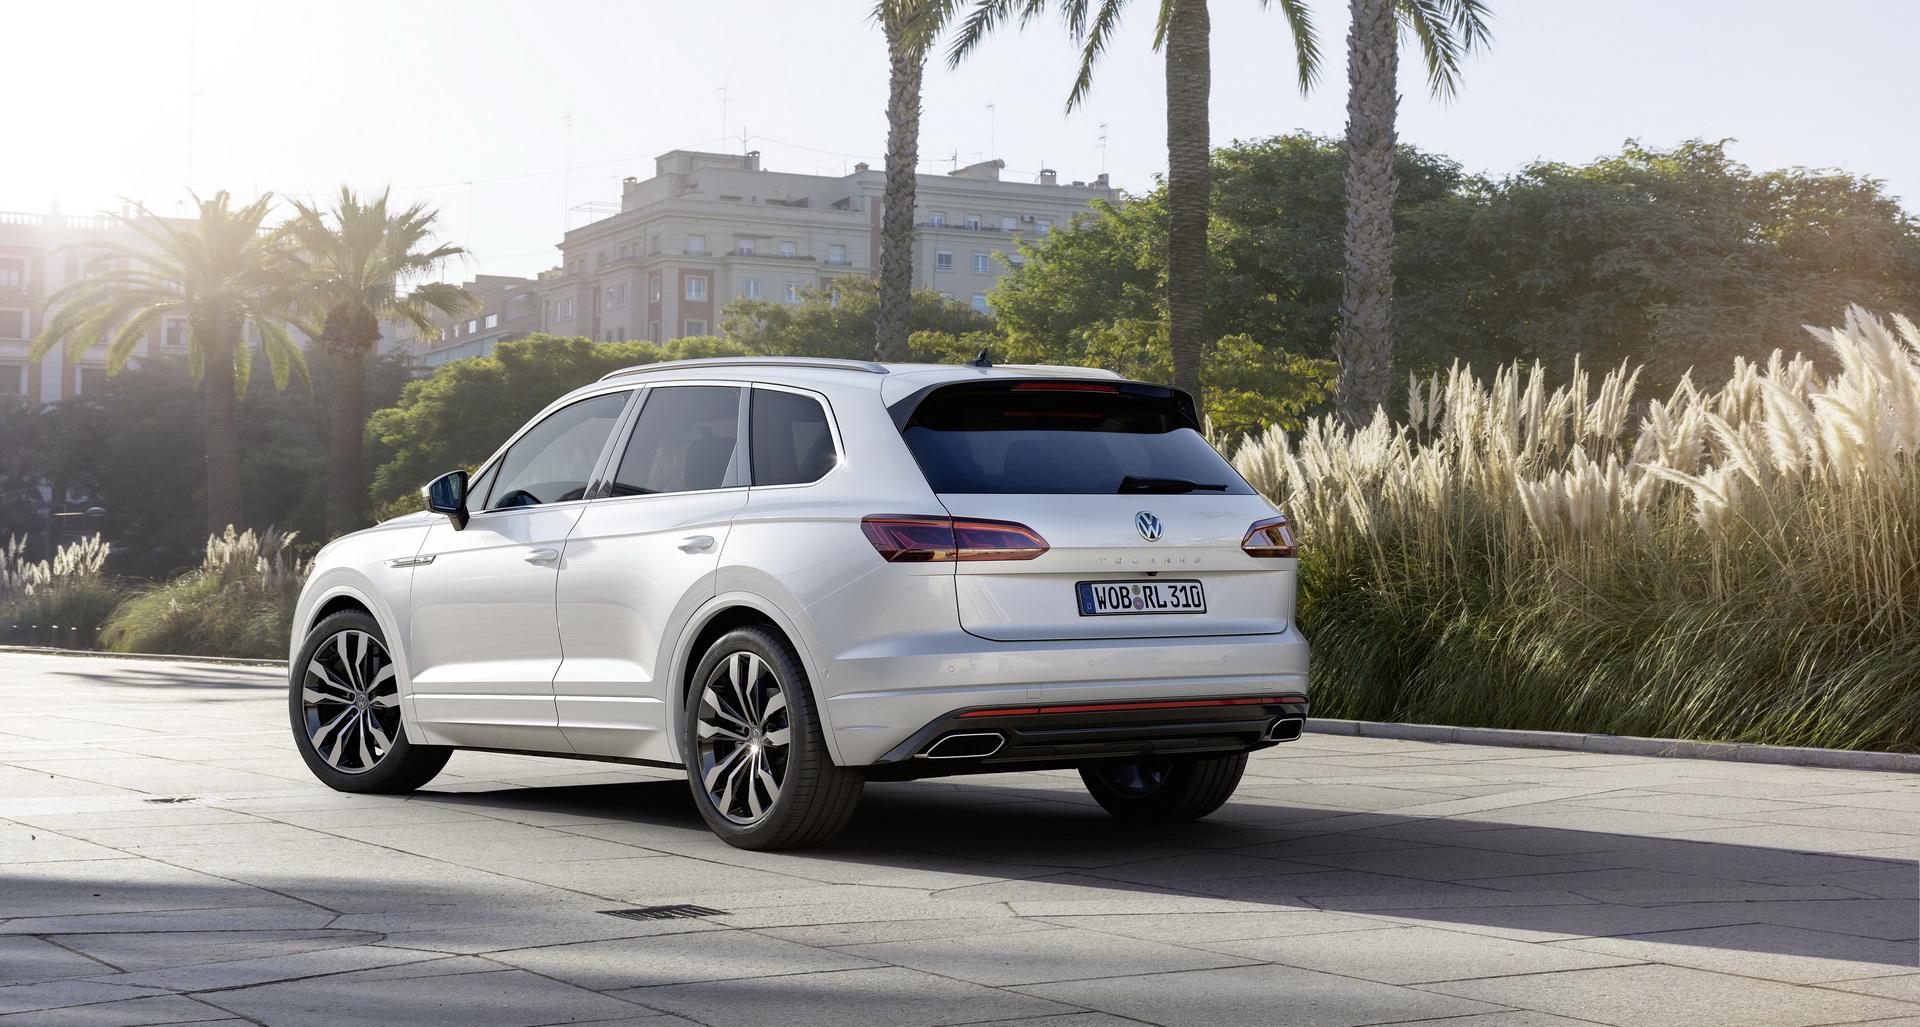 Volkswagen Touareg 2018 (22)